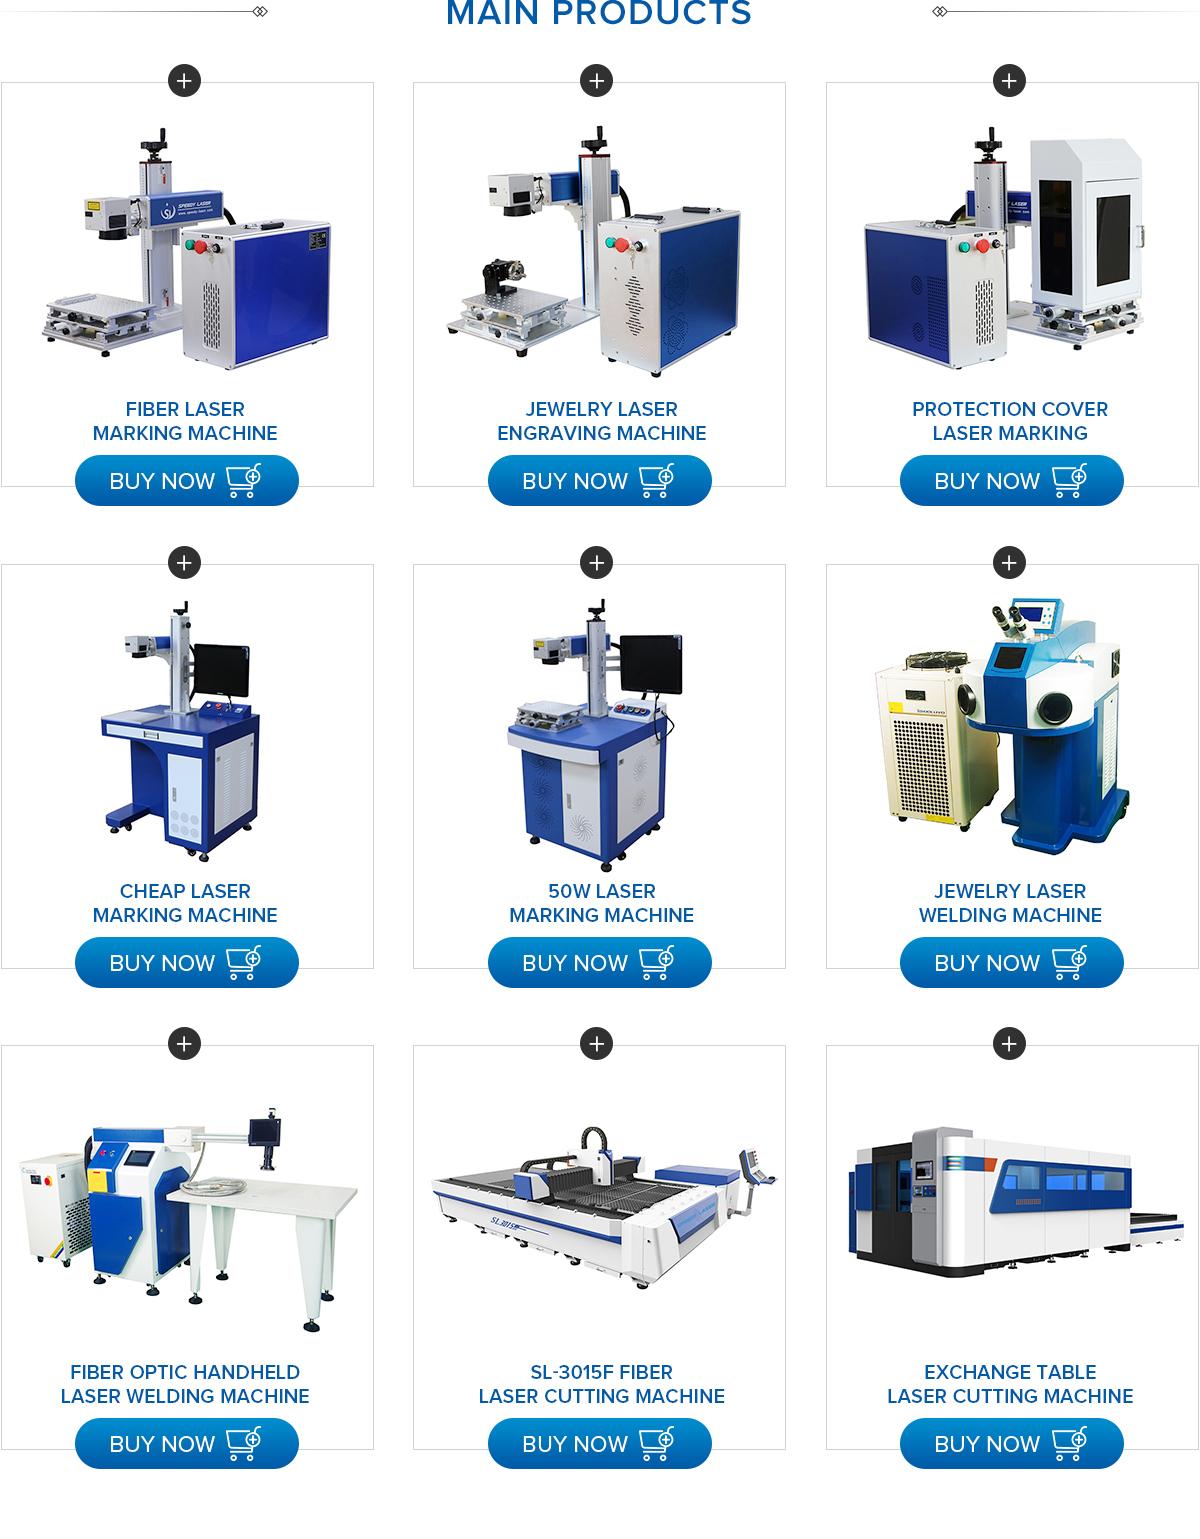 Nanjing Speedy Laser Technology Co Ltd Marking Machine Welding Diagram Free Shipping Raycus Ipg Fiber 20w 30w 50w Price